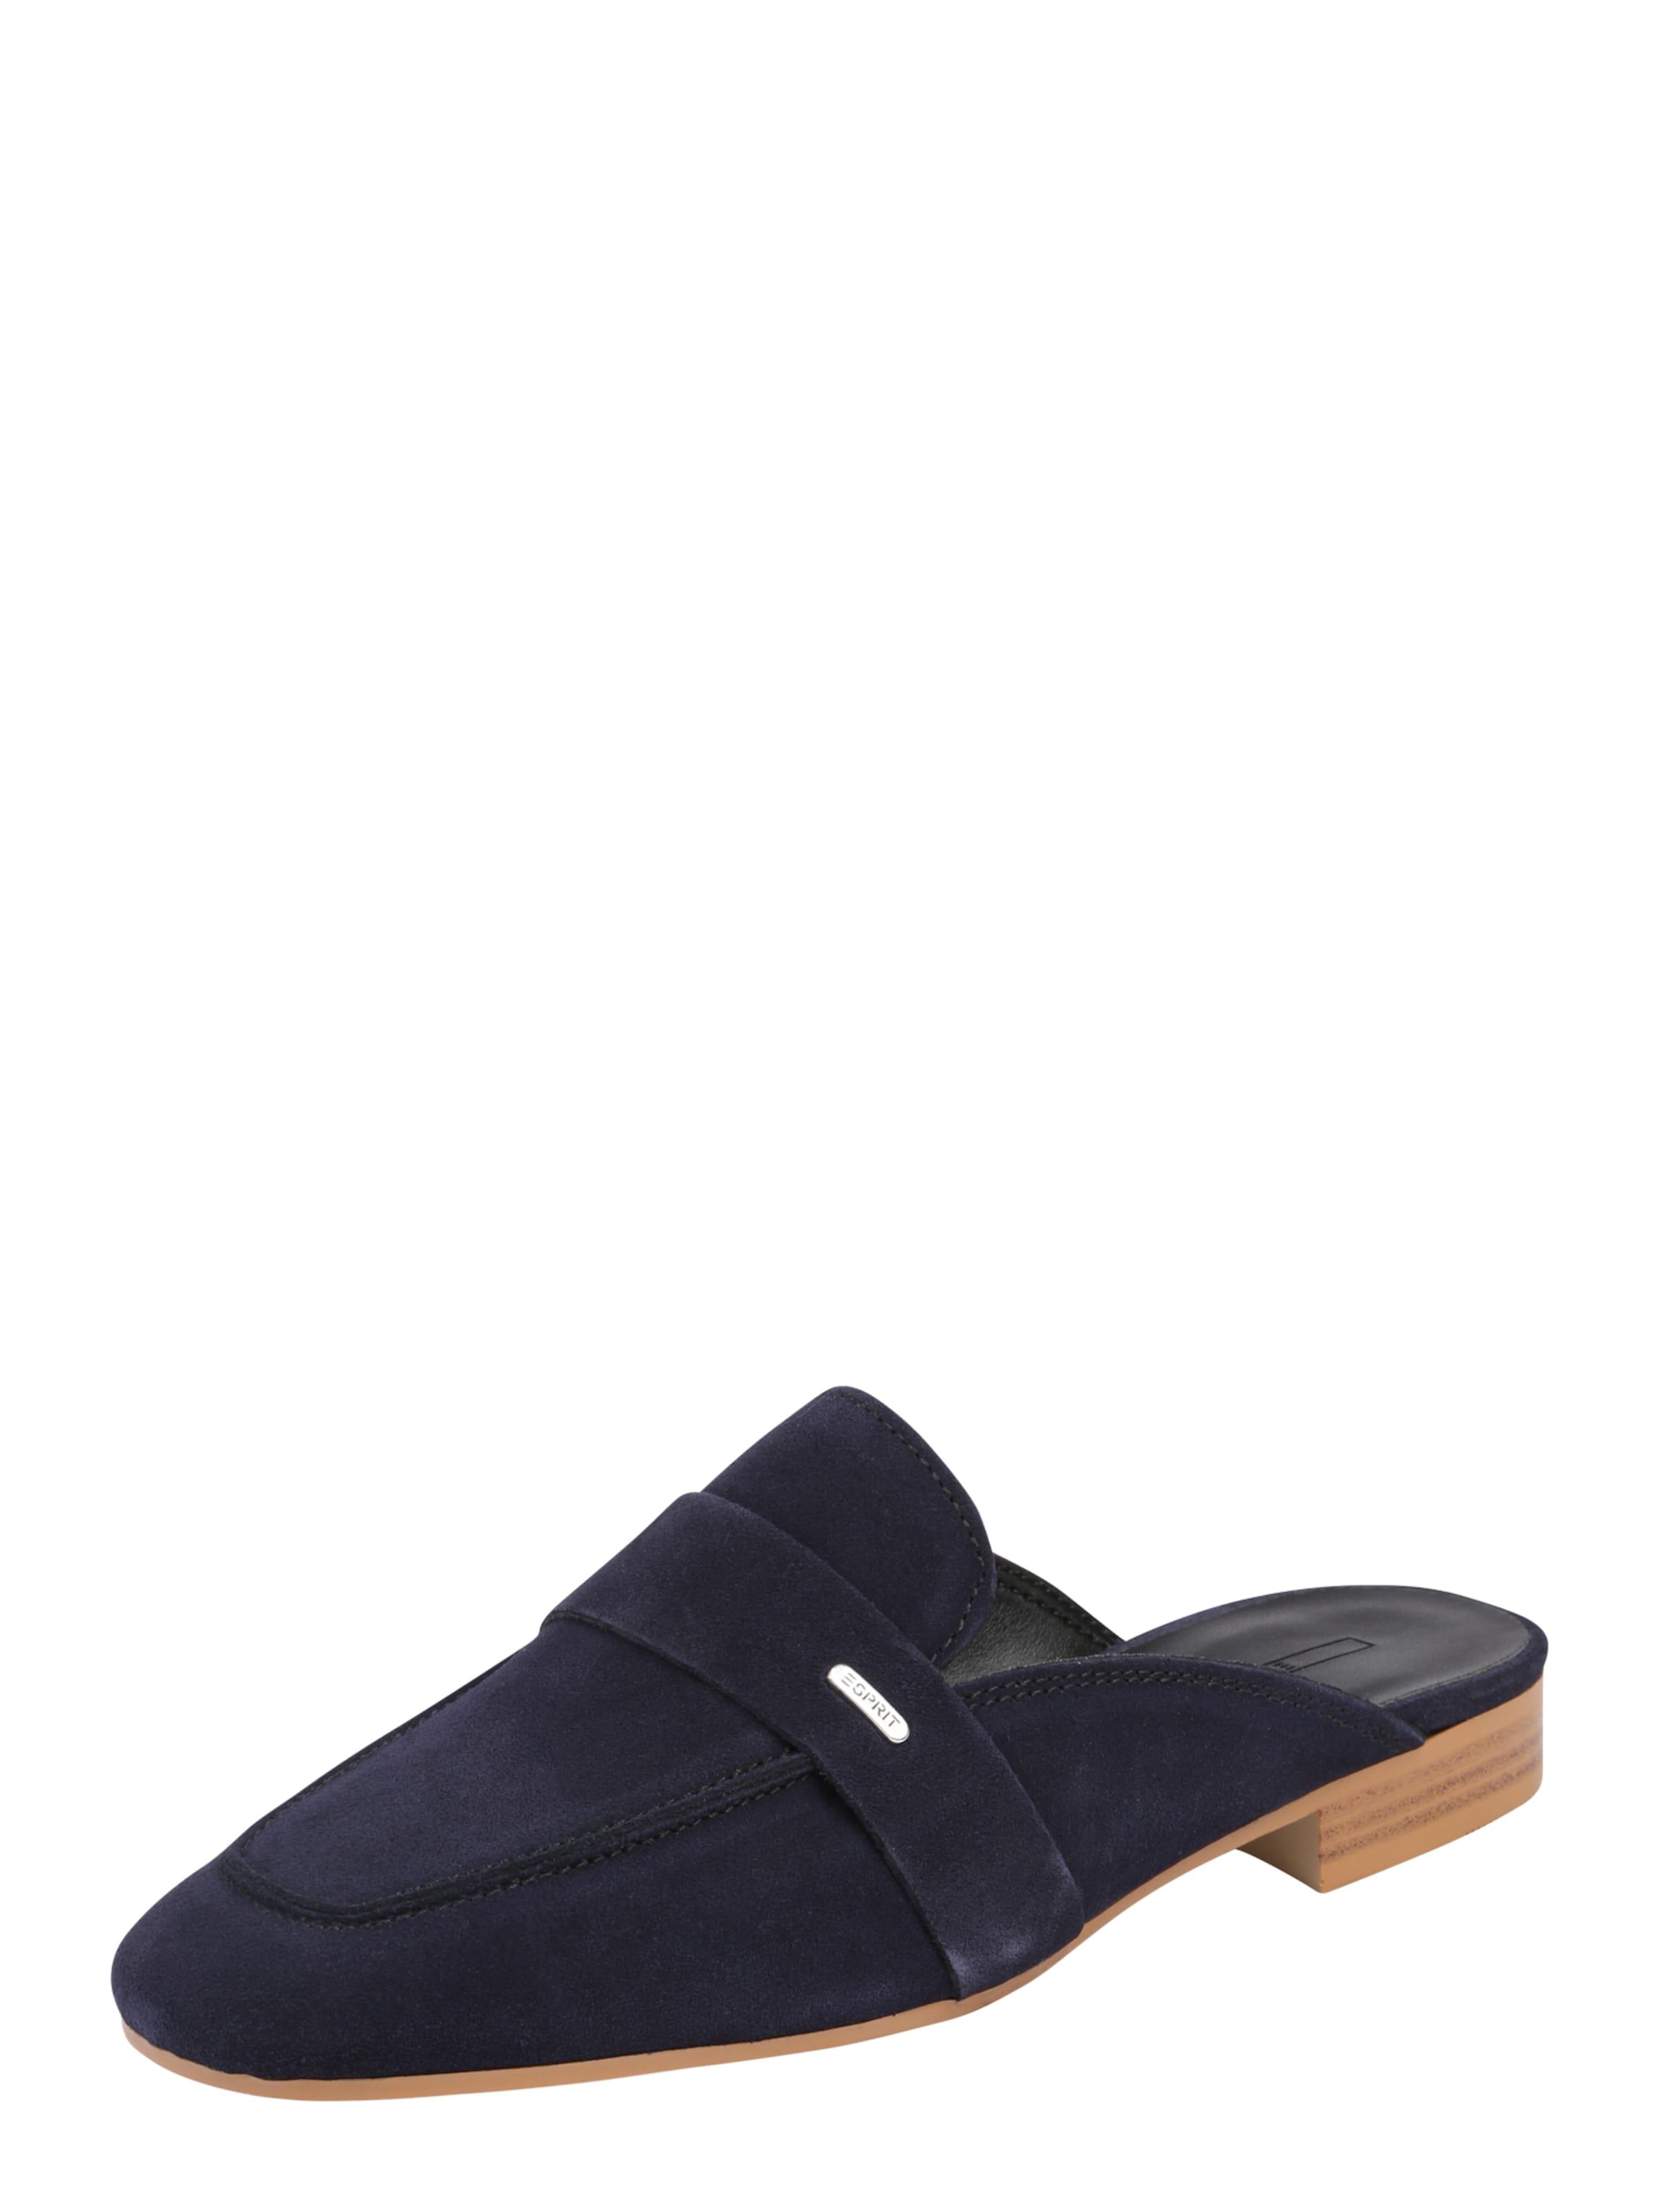 Haltbare Mode billige Schuhe ESPRIT   Pantolette 'Manu' Schuhe Gut getragene Schuhe